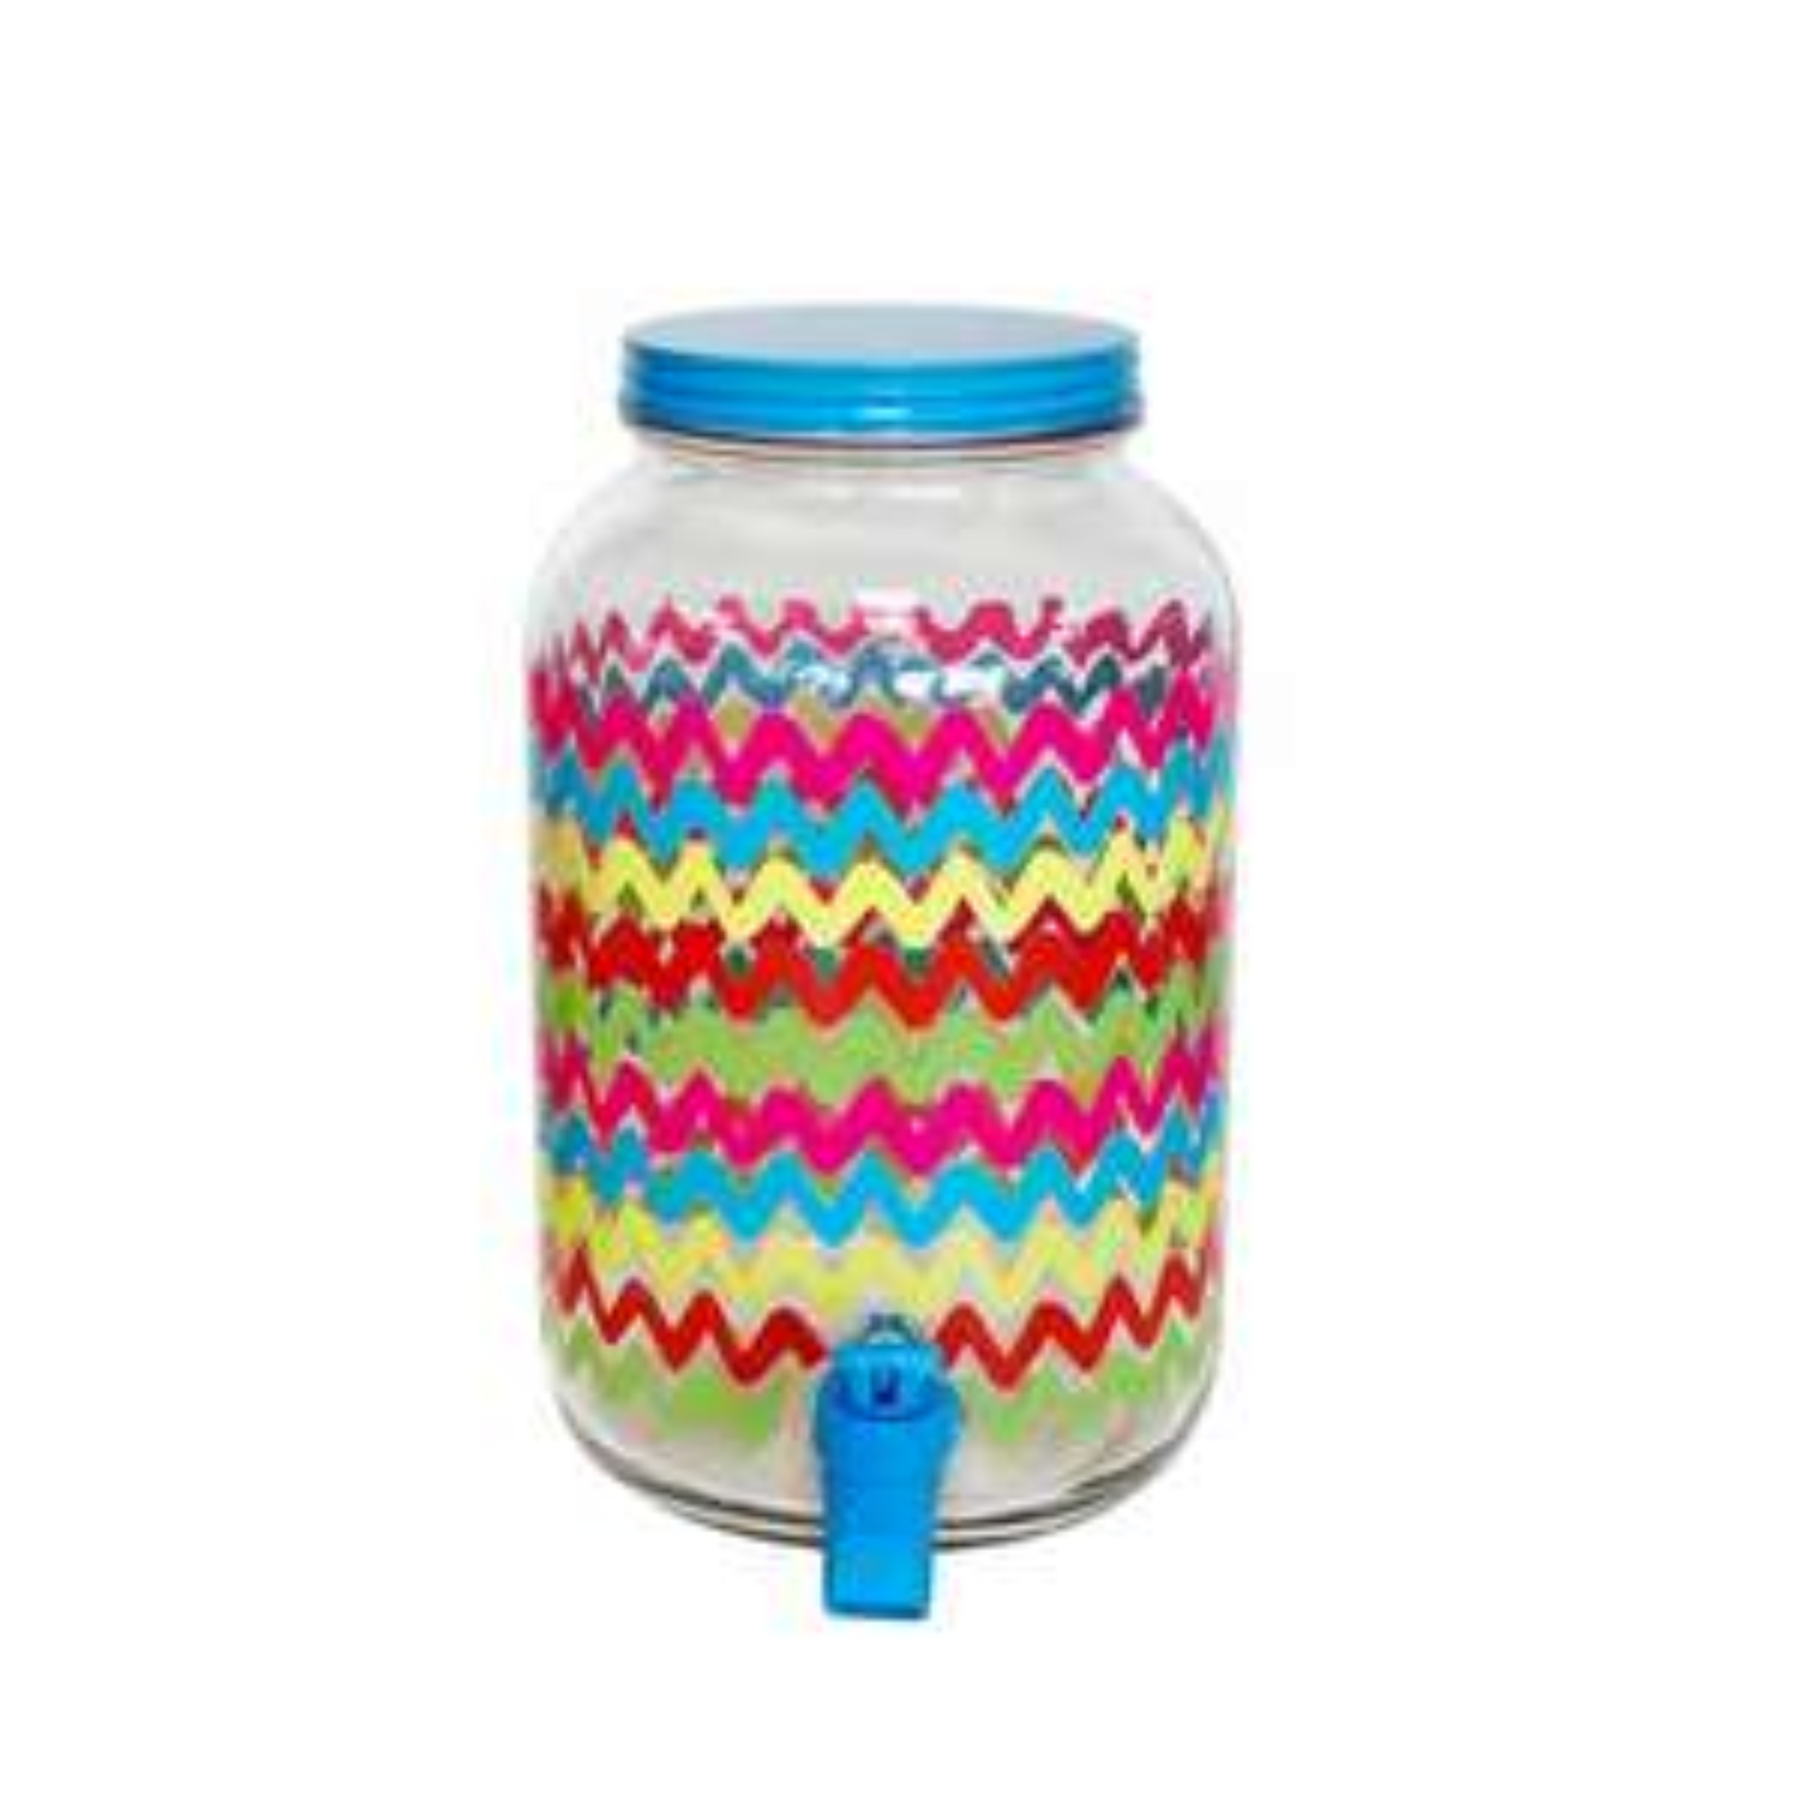 1/2 Price : 3.8L Multicoloured Drinks Dispenser Now £3.50 @ Asda ( Free C&C / In store )